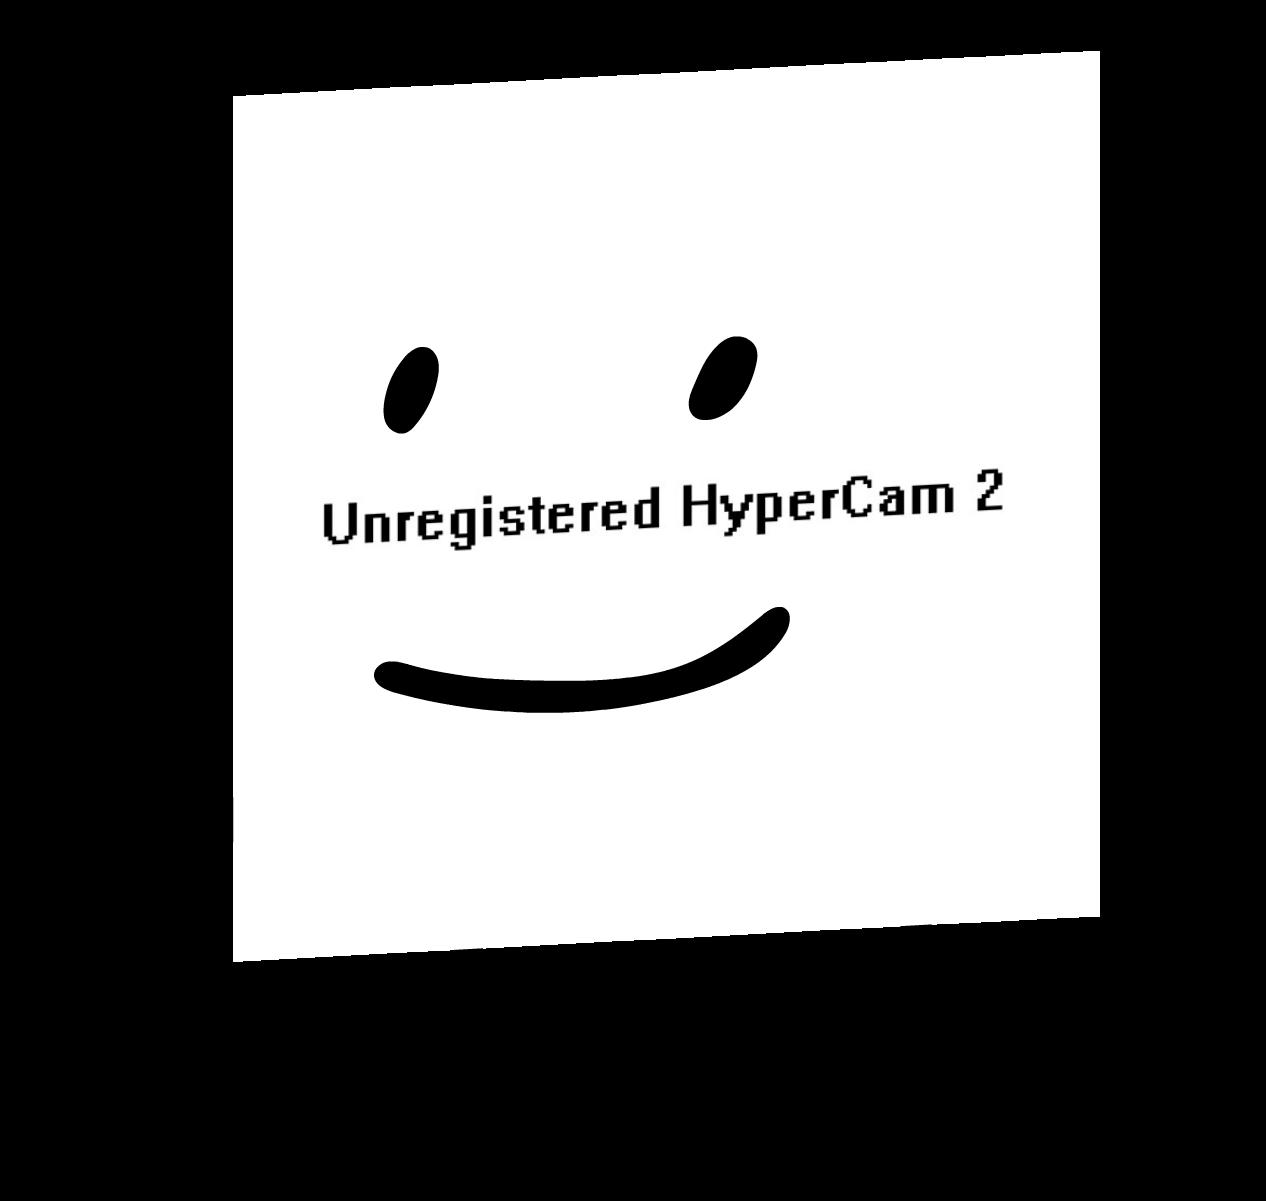 Unregistered Hypercam 2 | Object Filler Wiki | FANDOM powered by Wikia